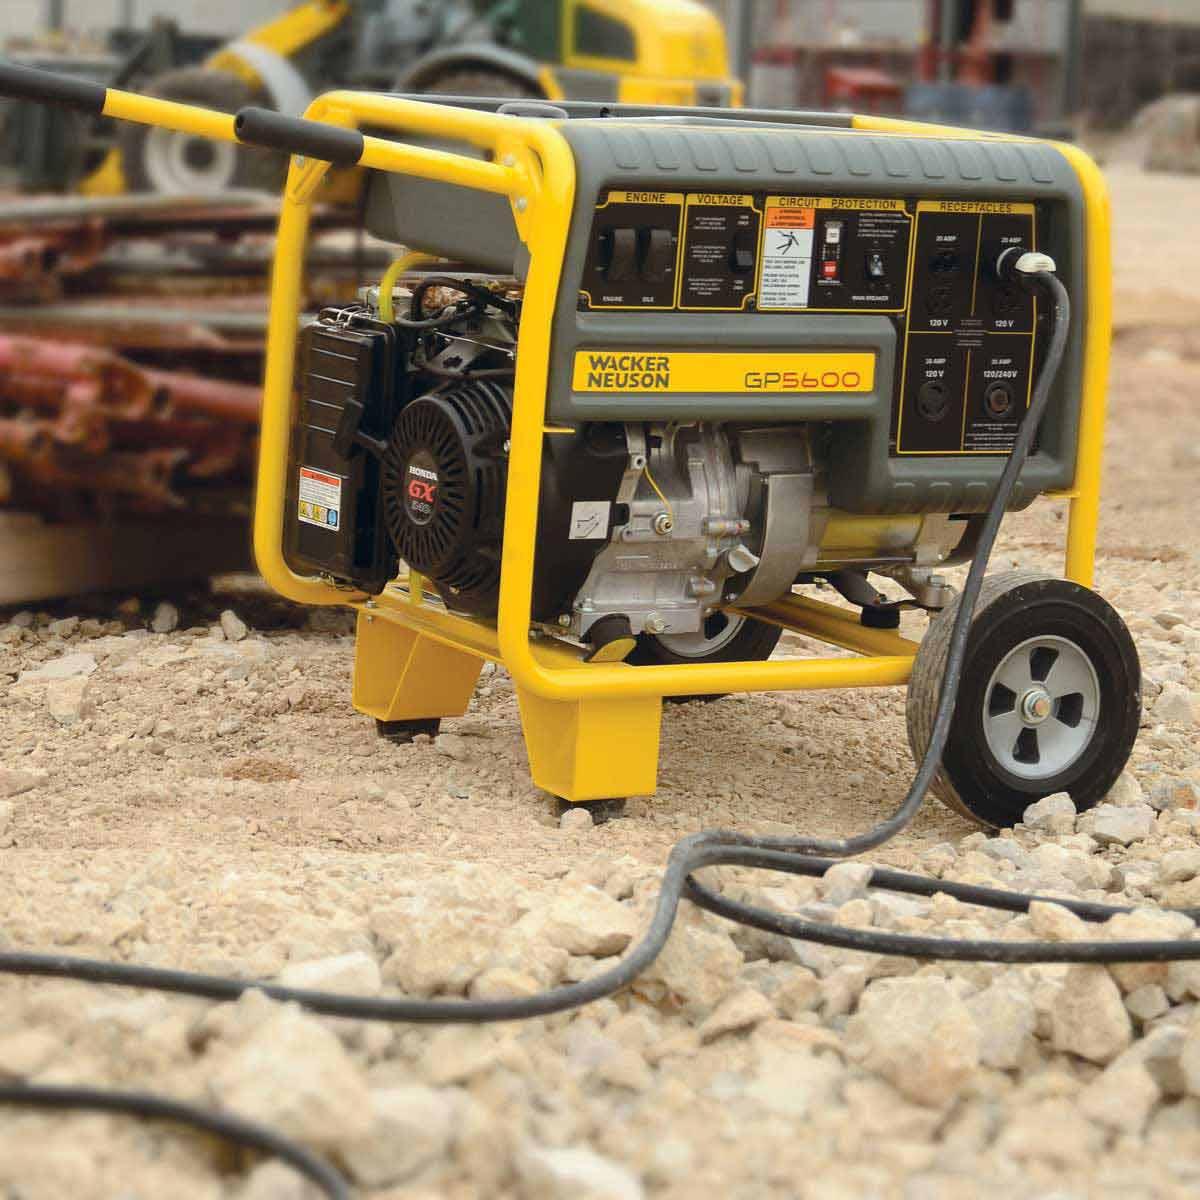 GP series portable generator kit